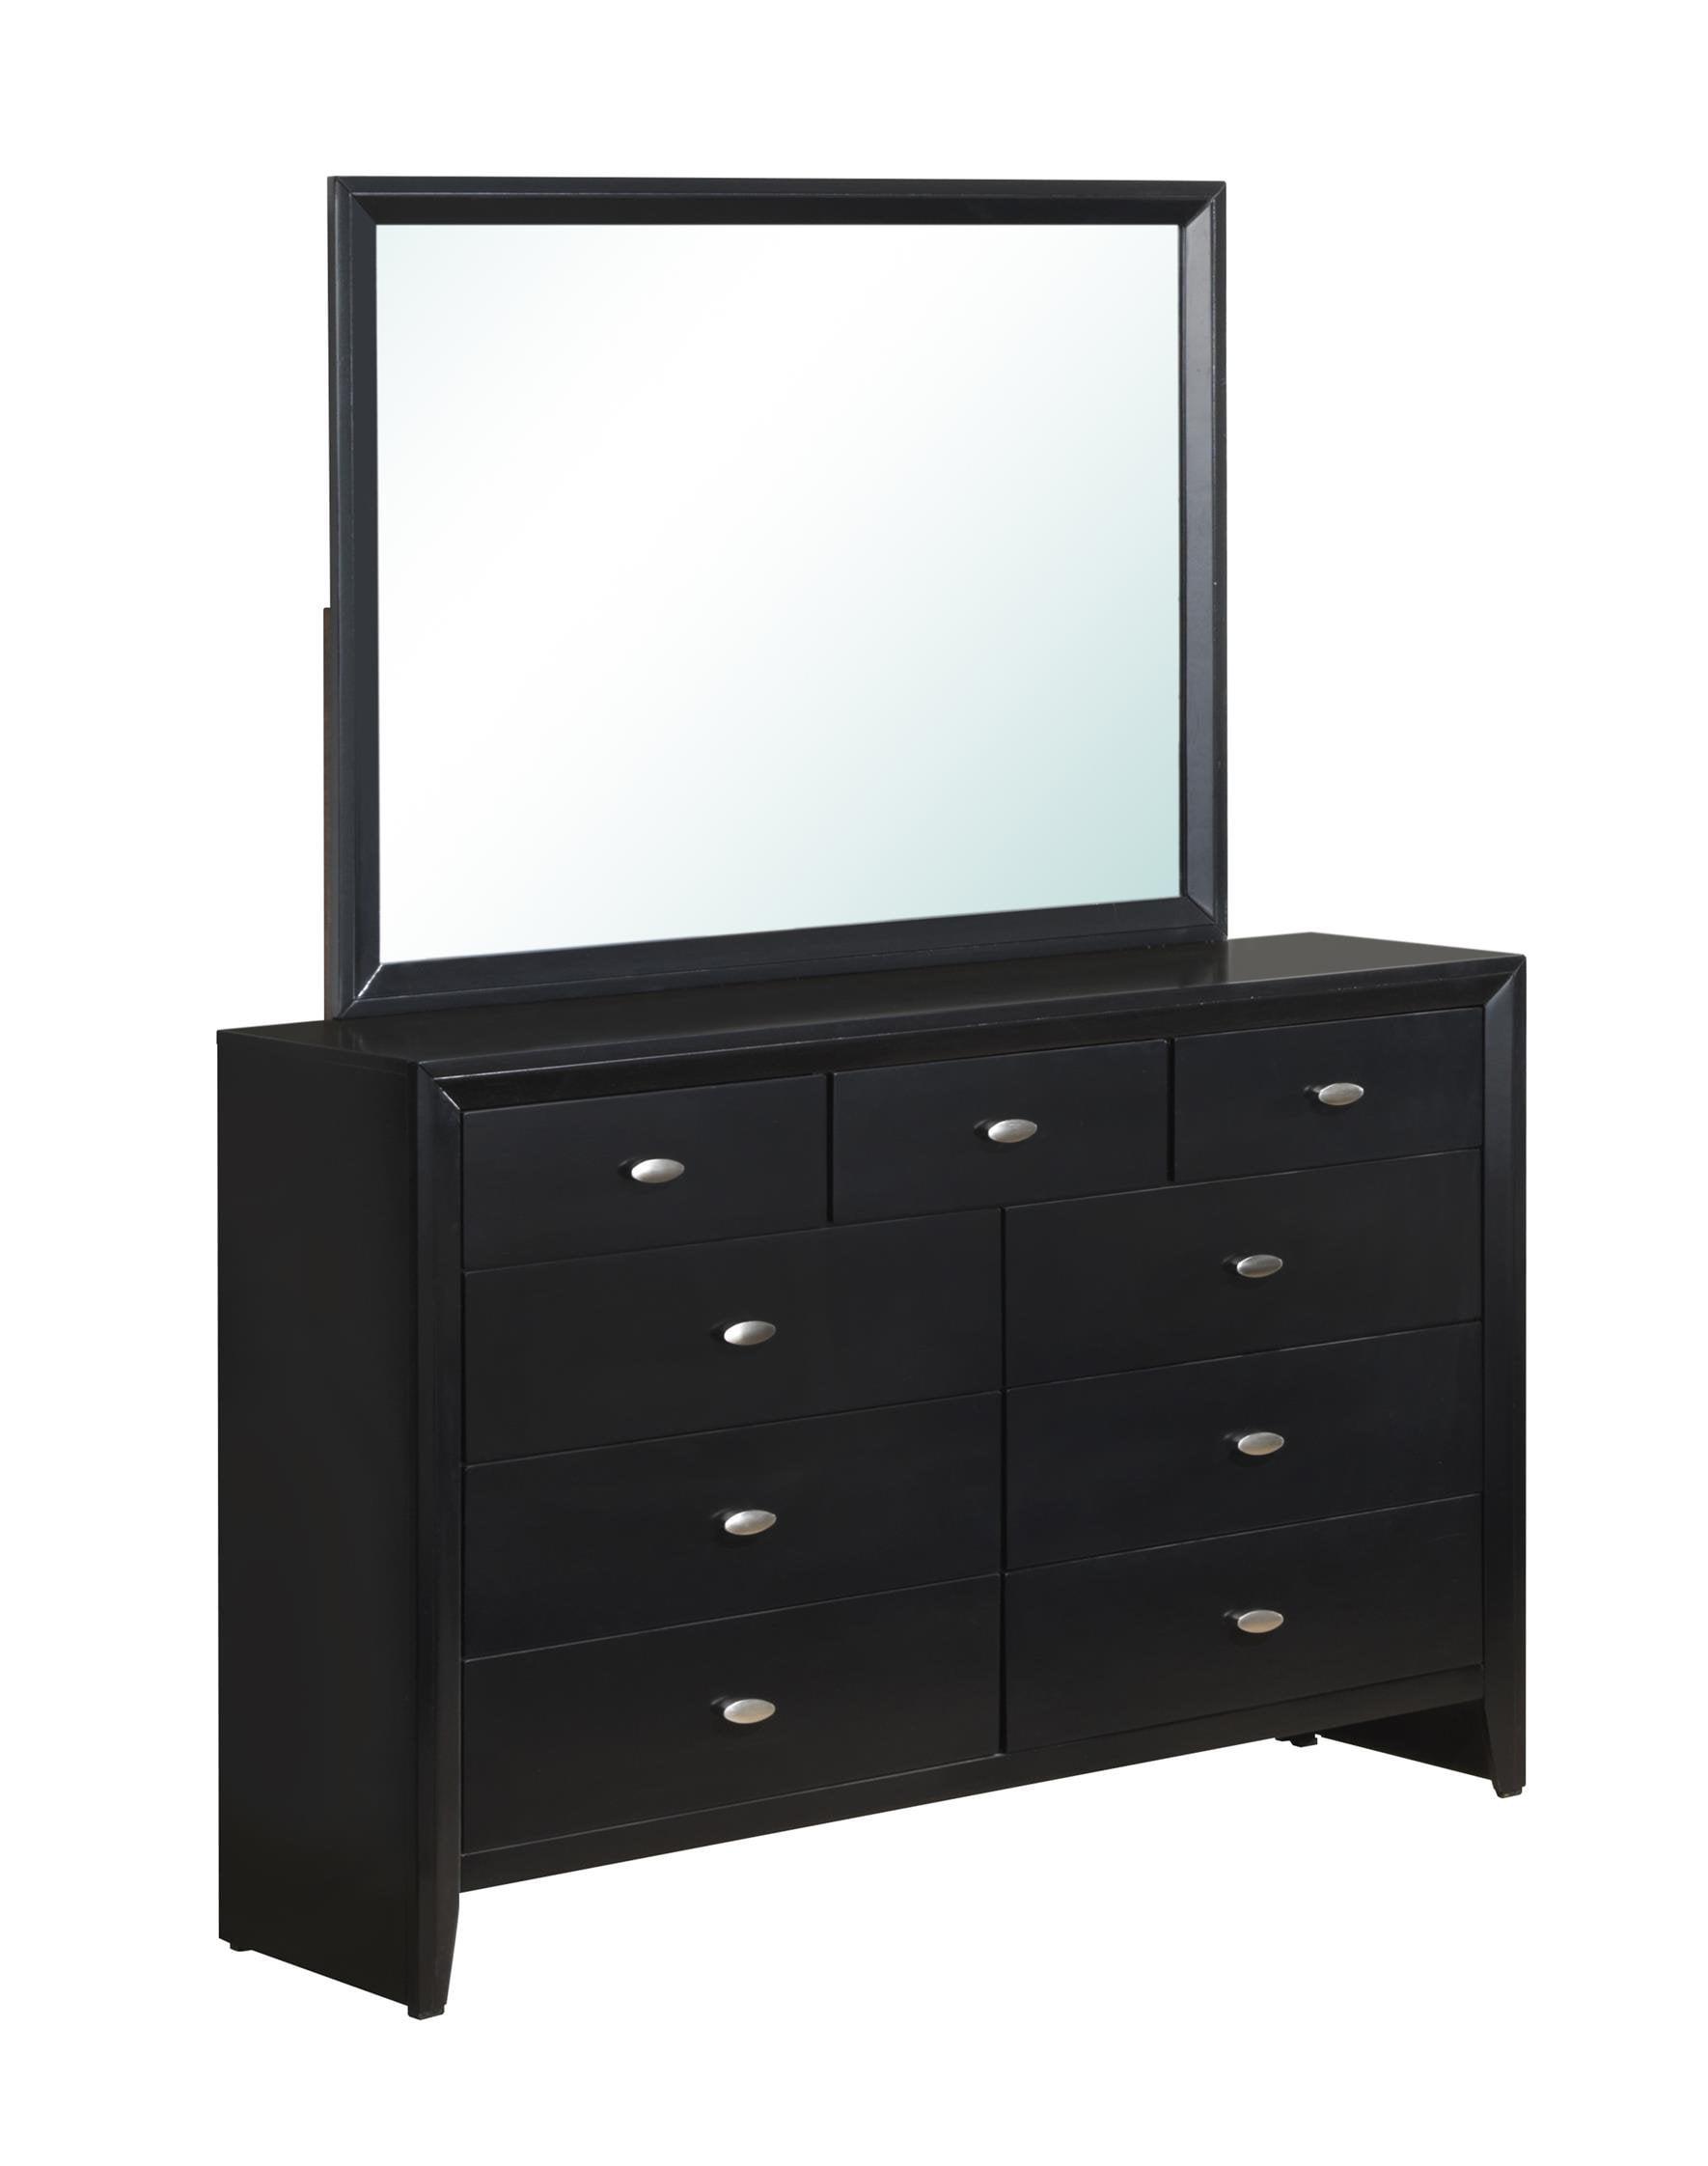 Global Carolina Mirror Black 7089 by Supplier Generic